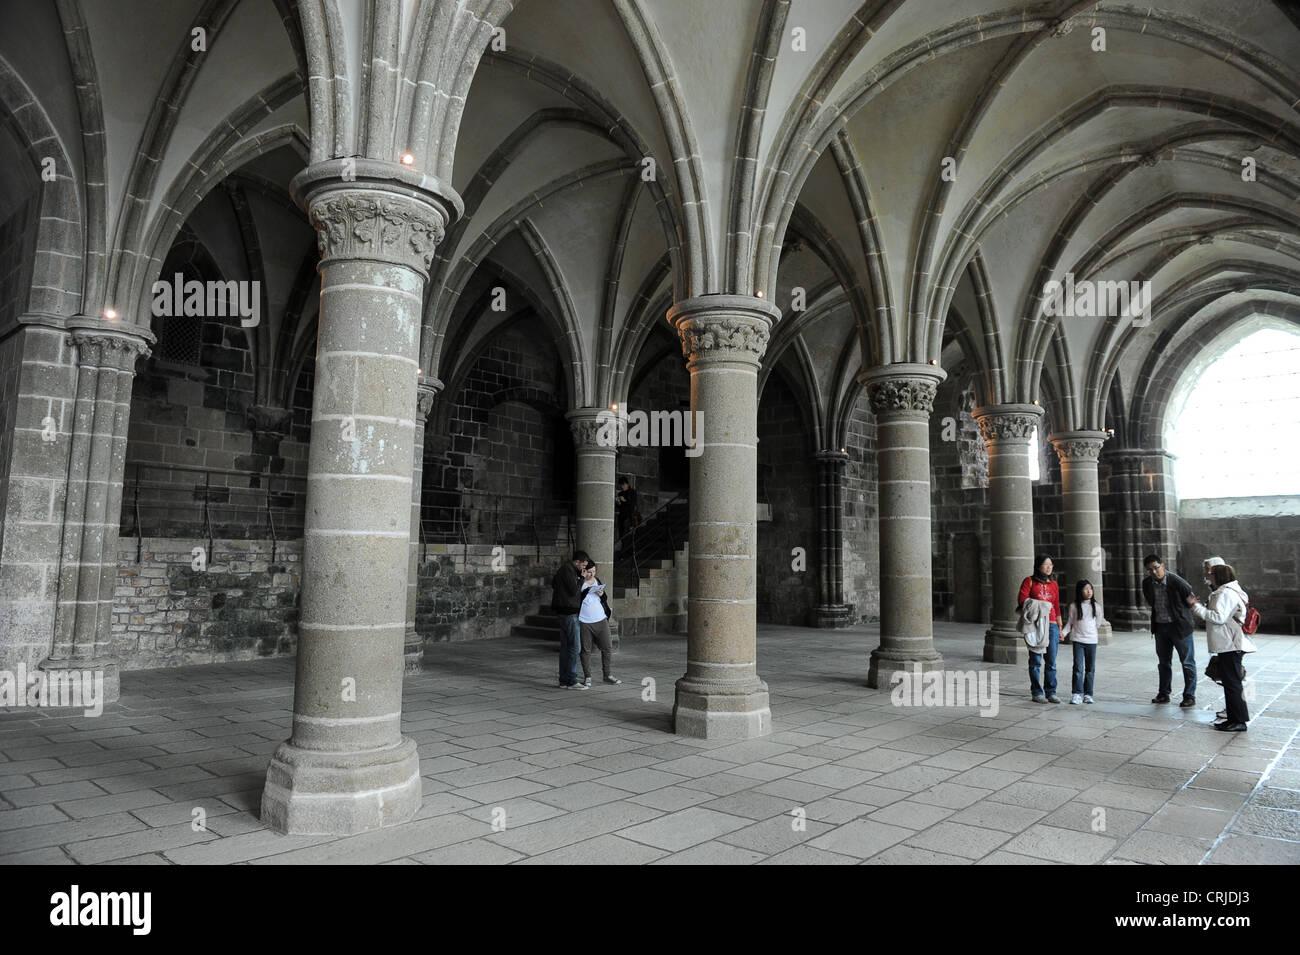 Le Mont Saint-Michel Interieur der Rittersaal Stockfoto, Bild ...